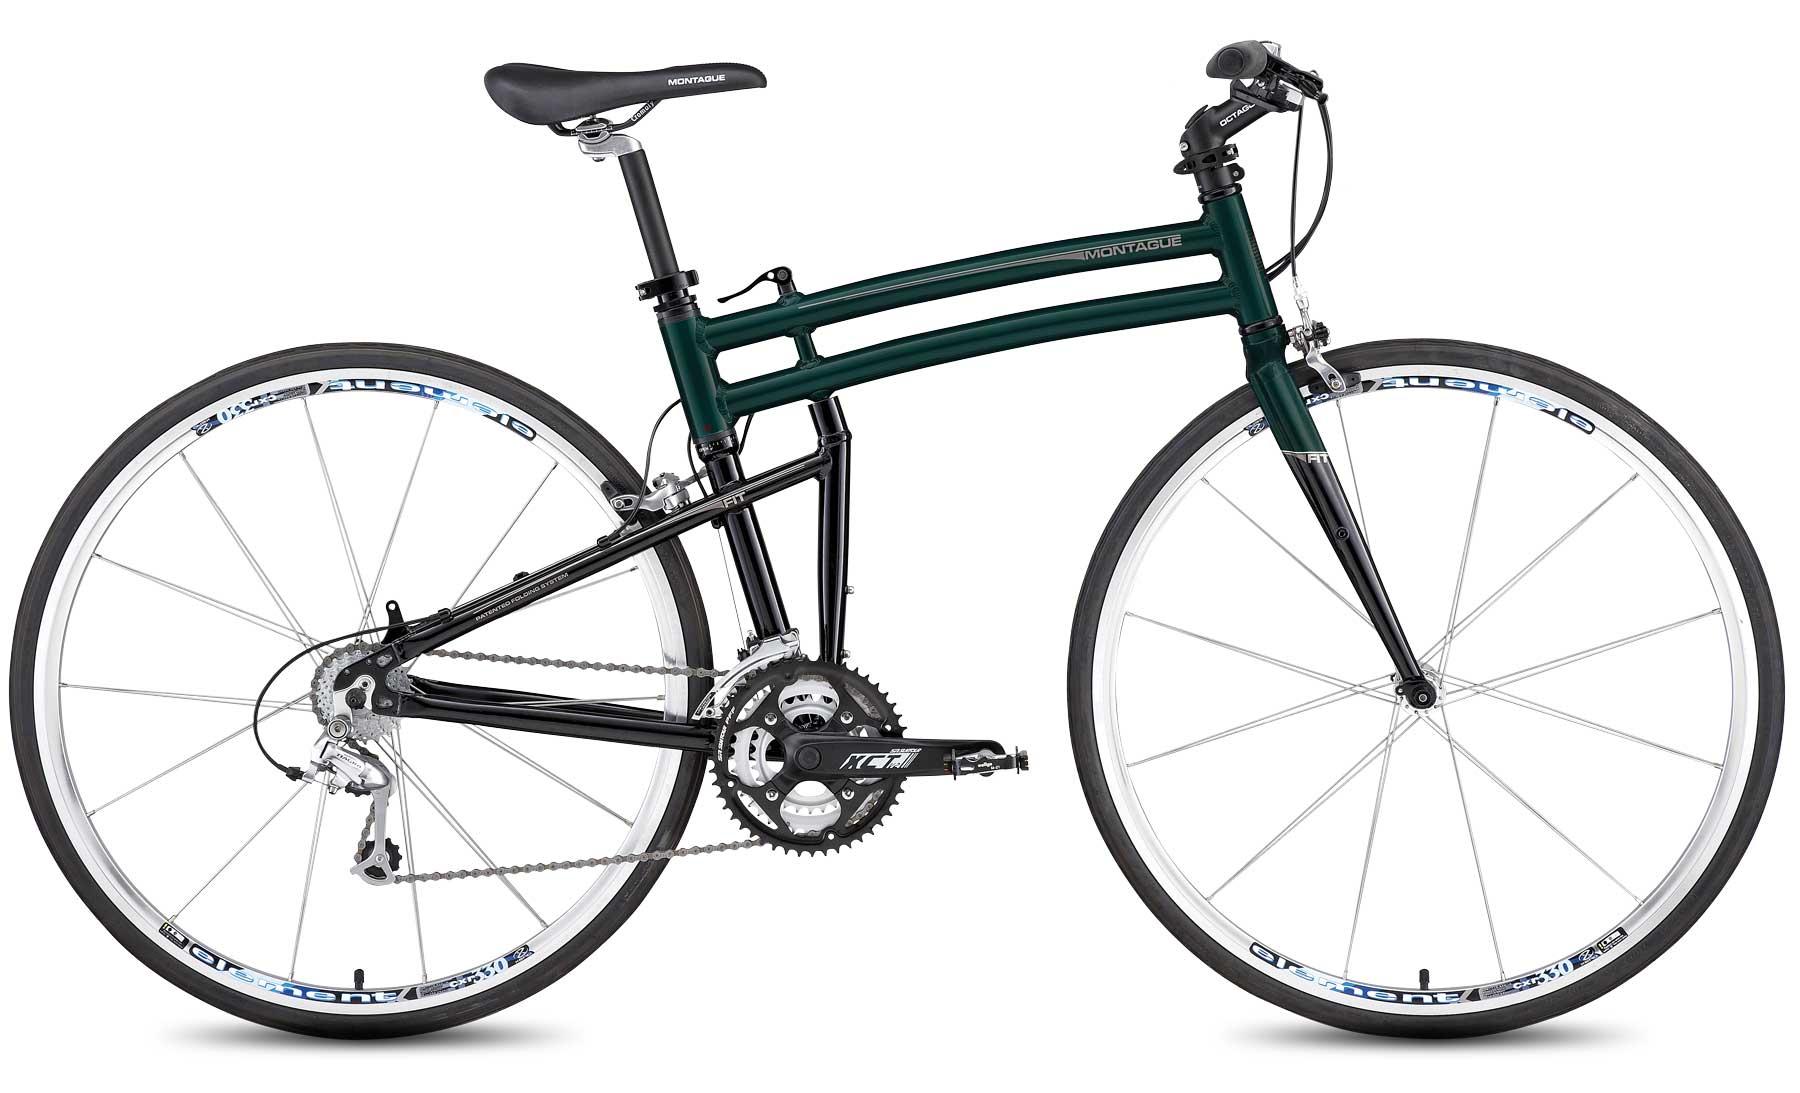 2010 FIT Folding Bike